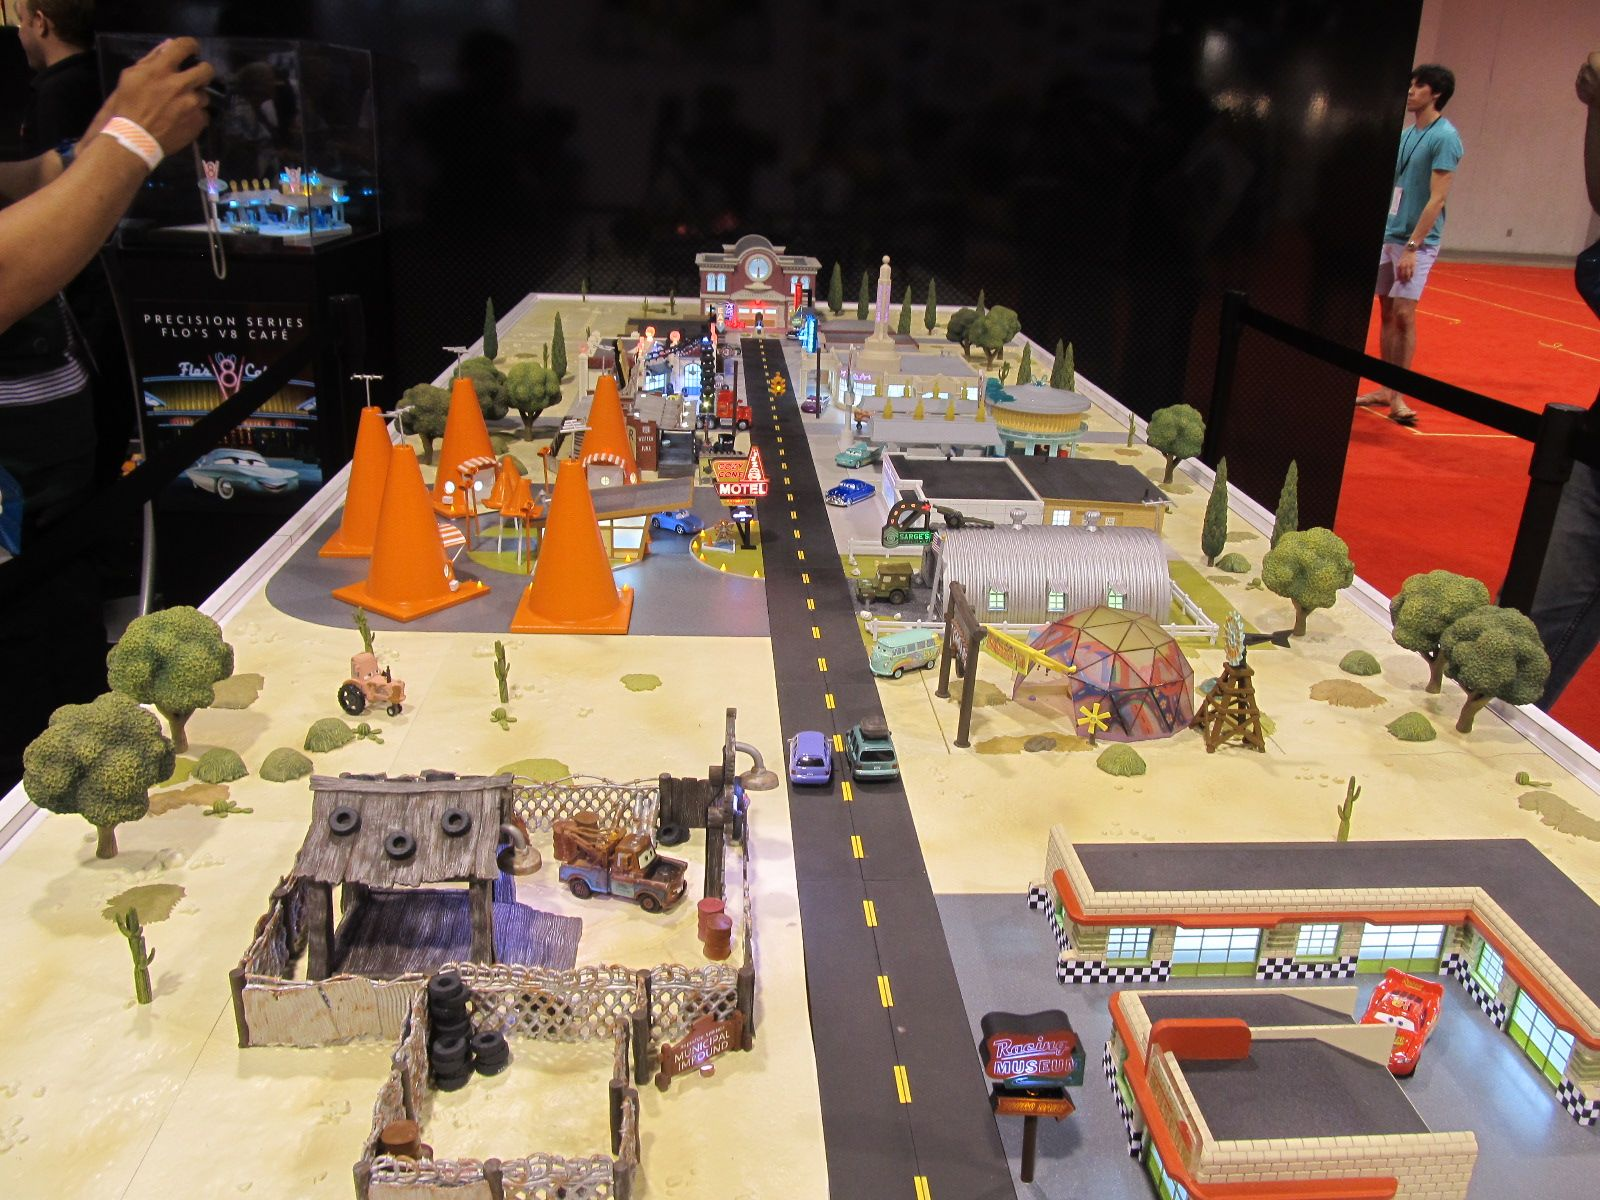 Model of Radiator Springs Disney cars theme party